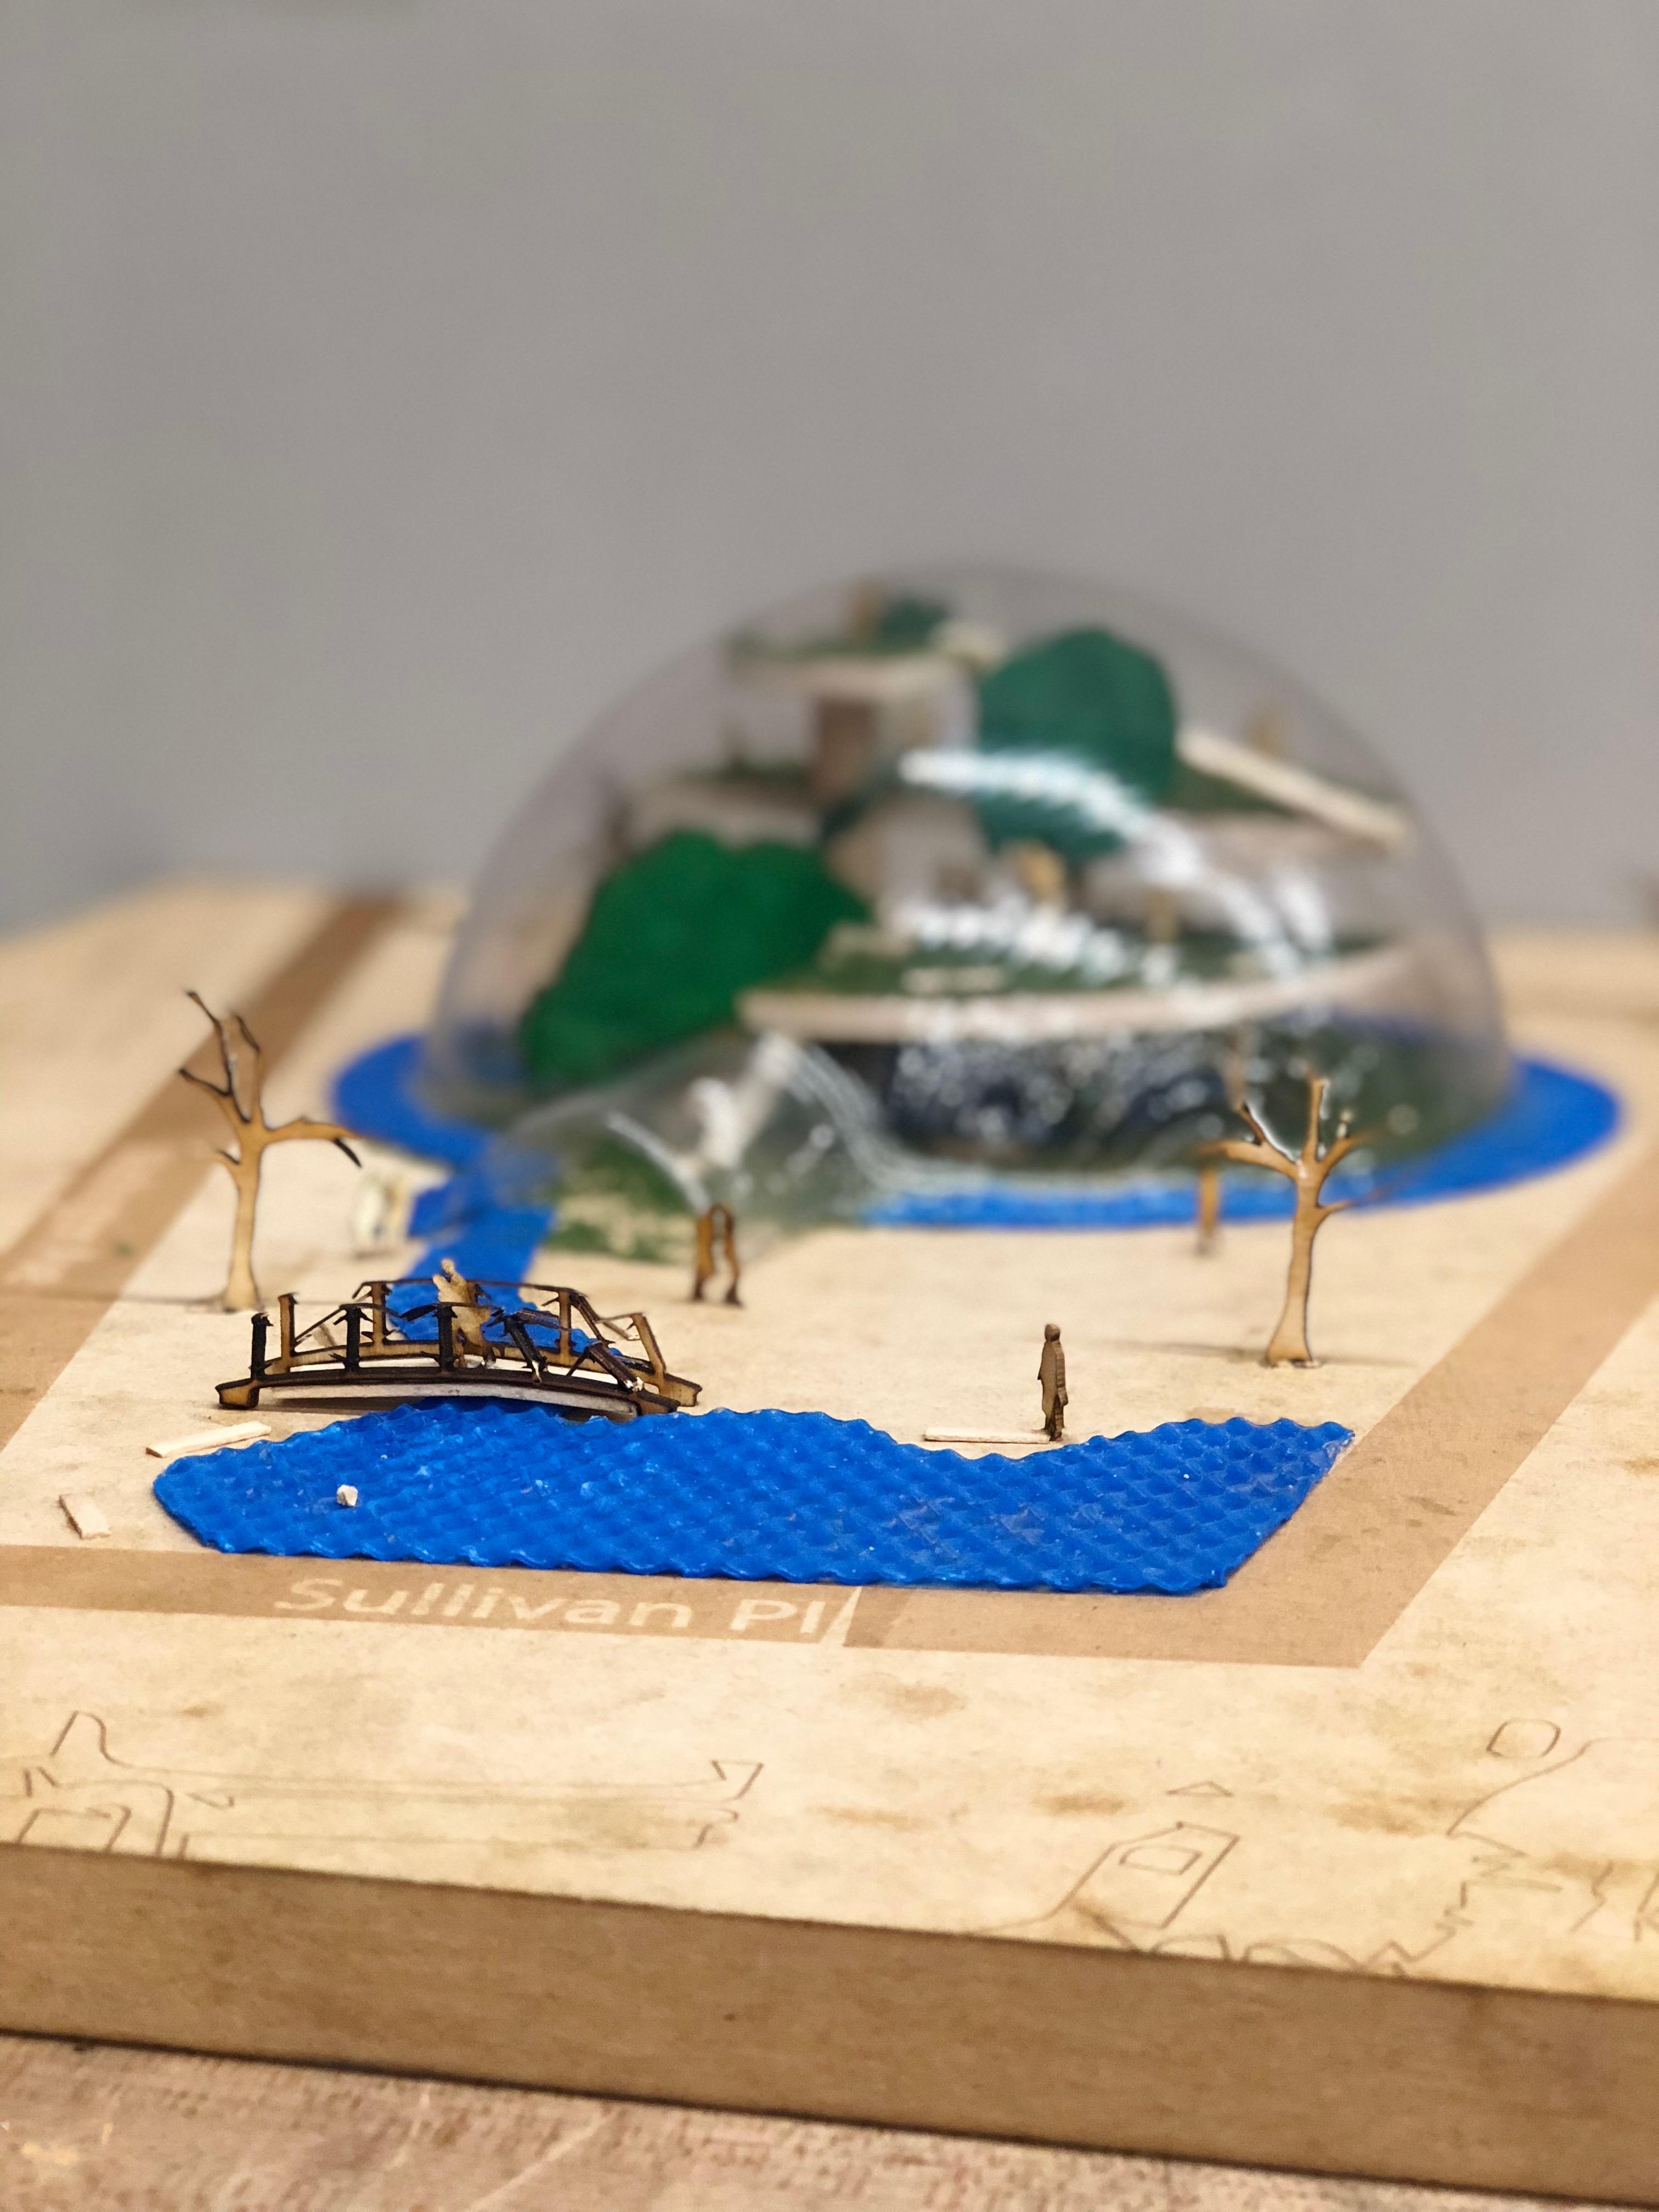 Constructed Environments Studio: BRIDGE IV